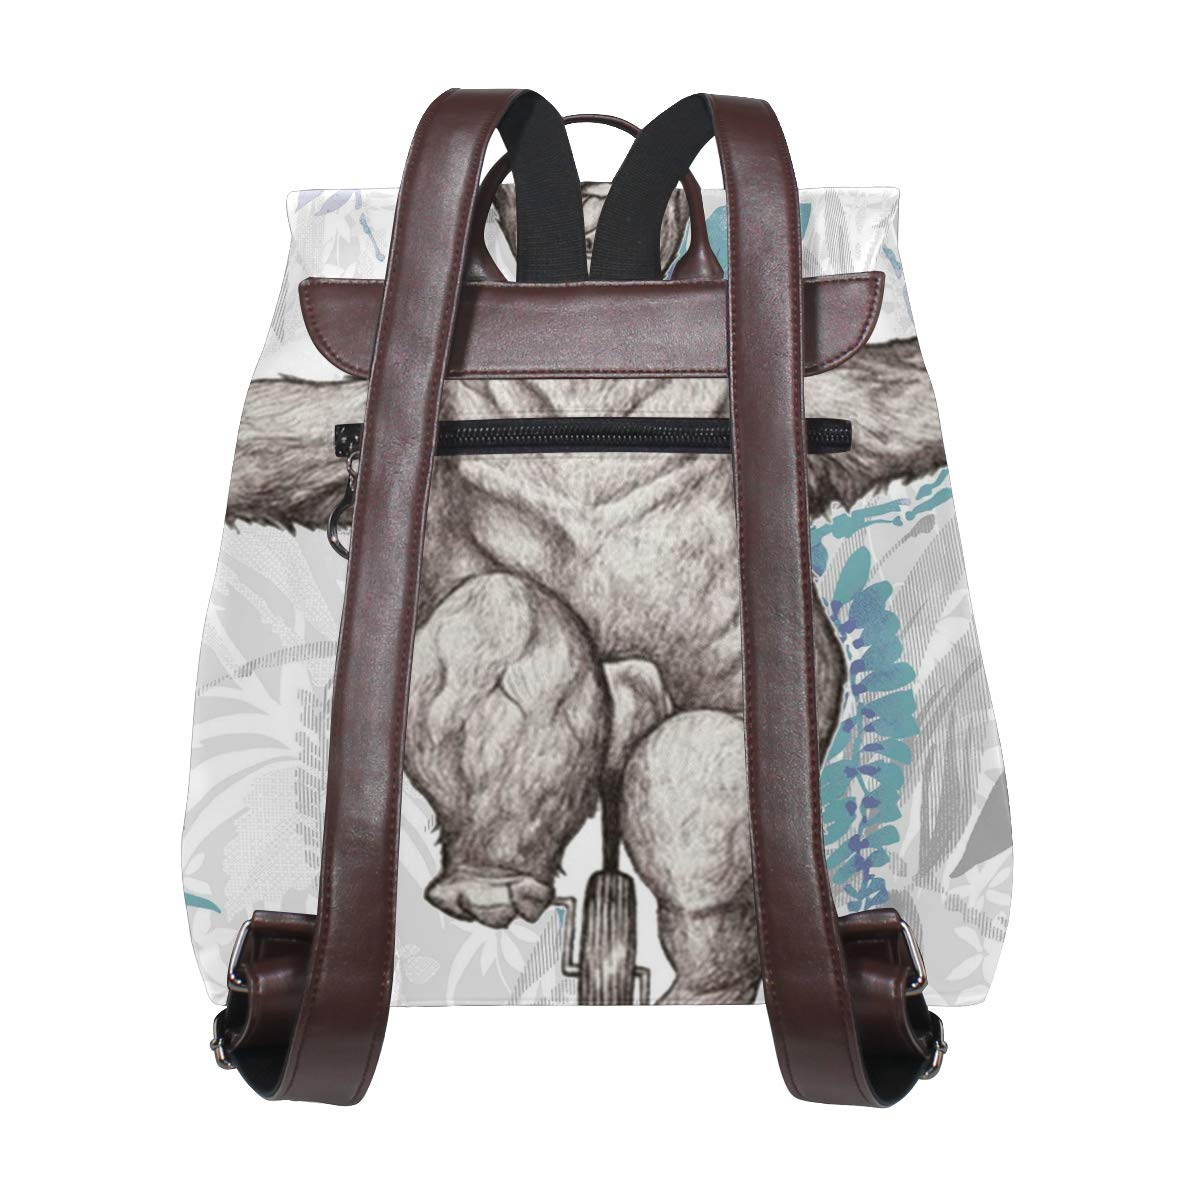 PU Leather Shoulder Bag,Funny Bear On Wheel Backpack,Portable Travel School Rucksack,Satchel with Top Handle